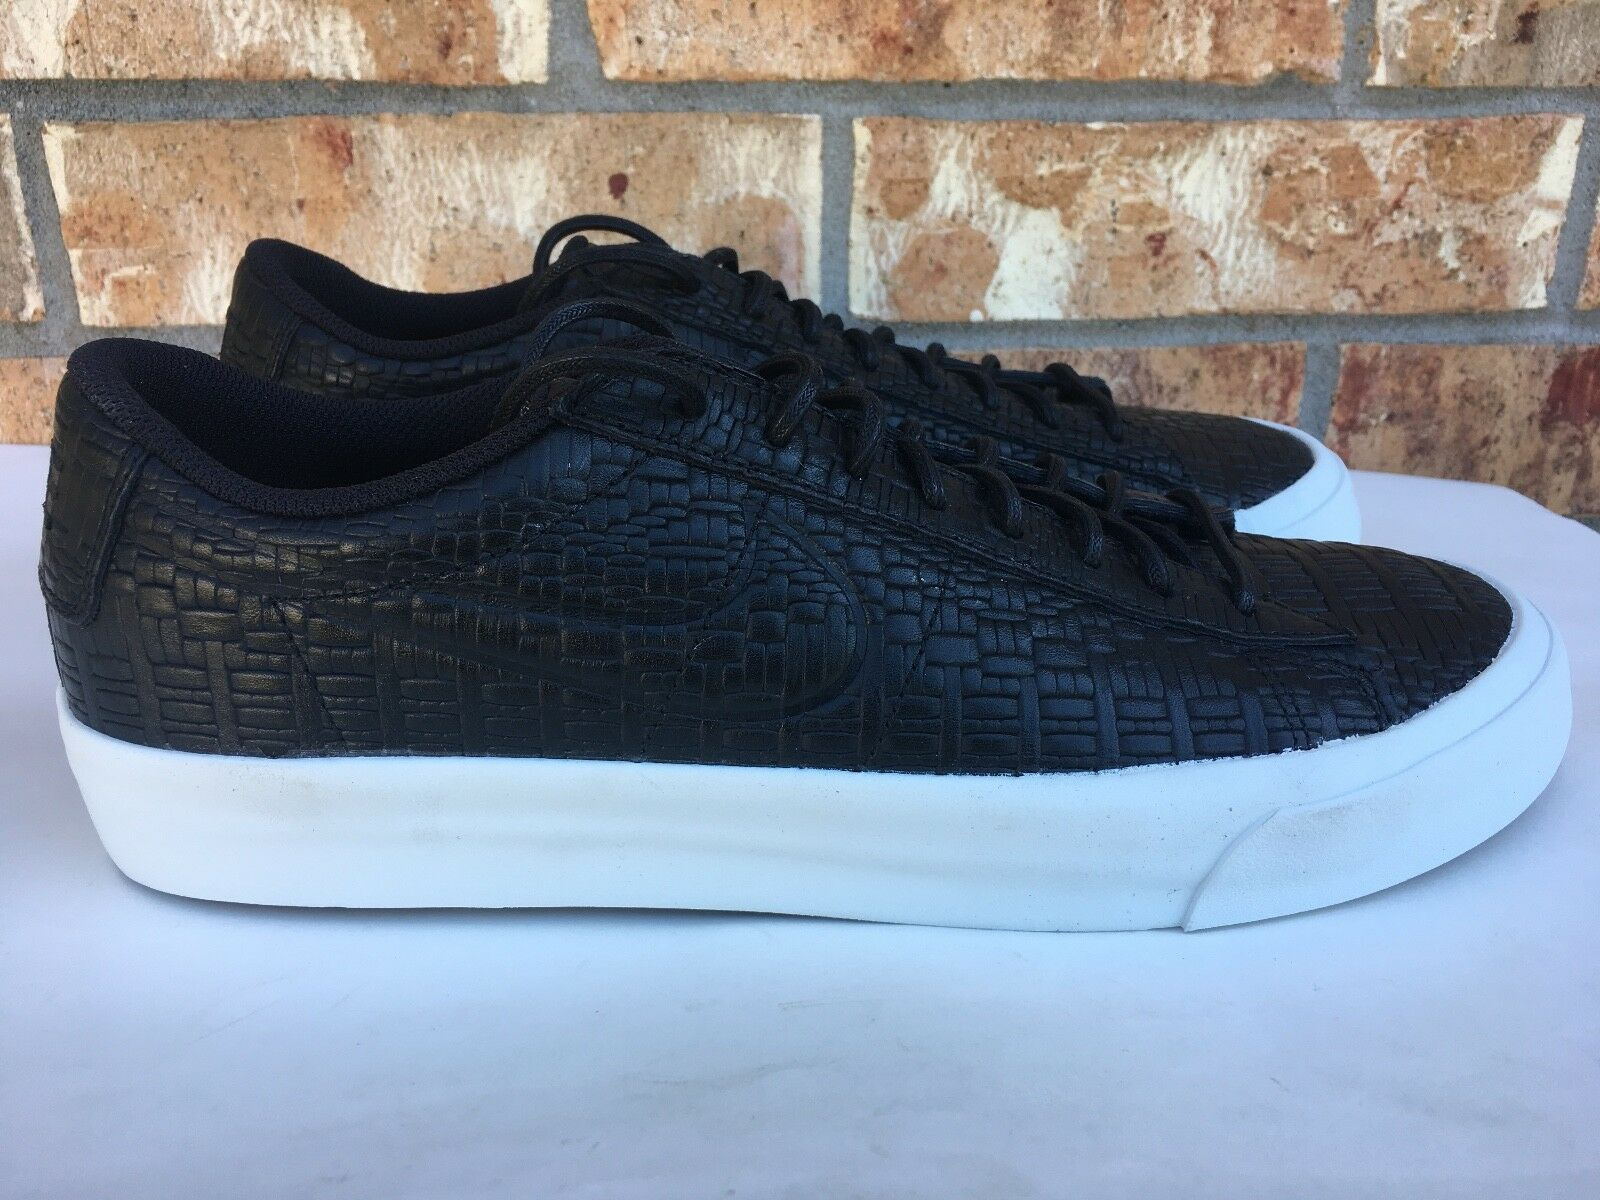 Hommes Nike Blazer Studio Low Noir blanc Croc Athletic Chaussures Sz 10.5 880872-001